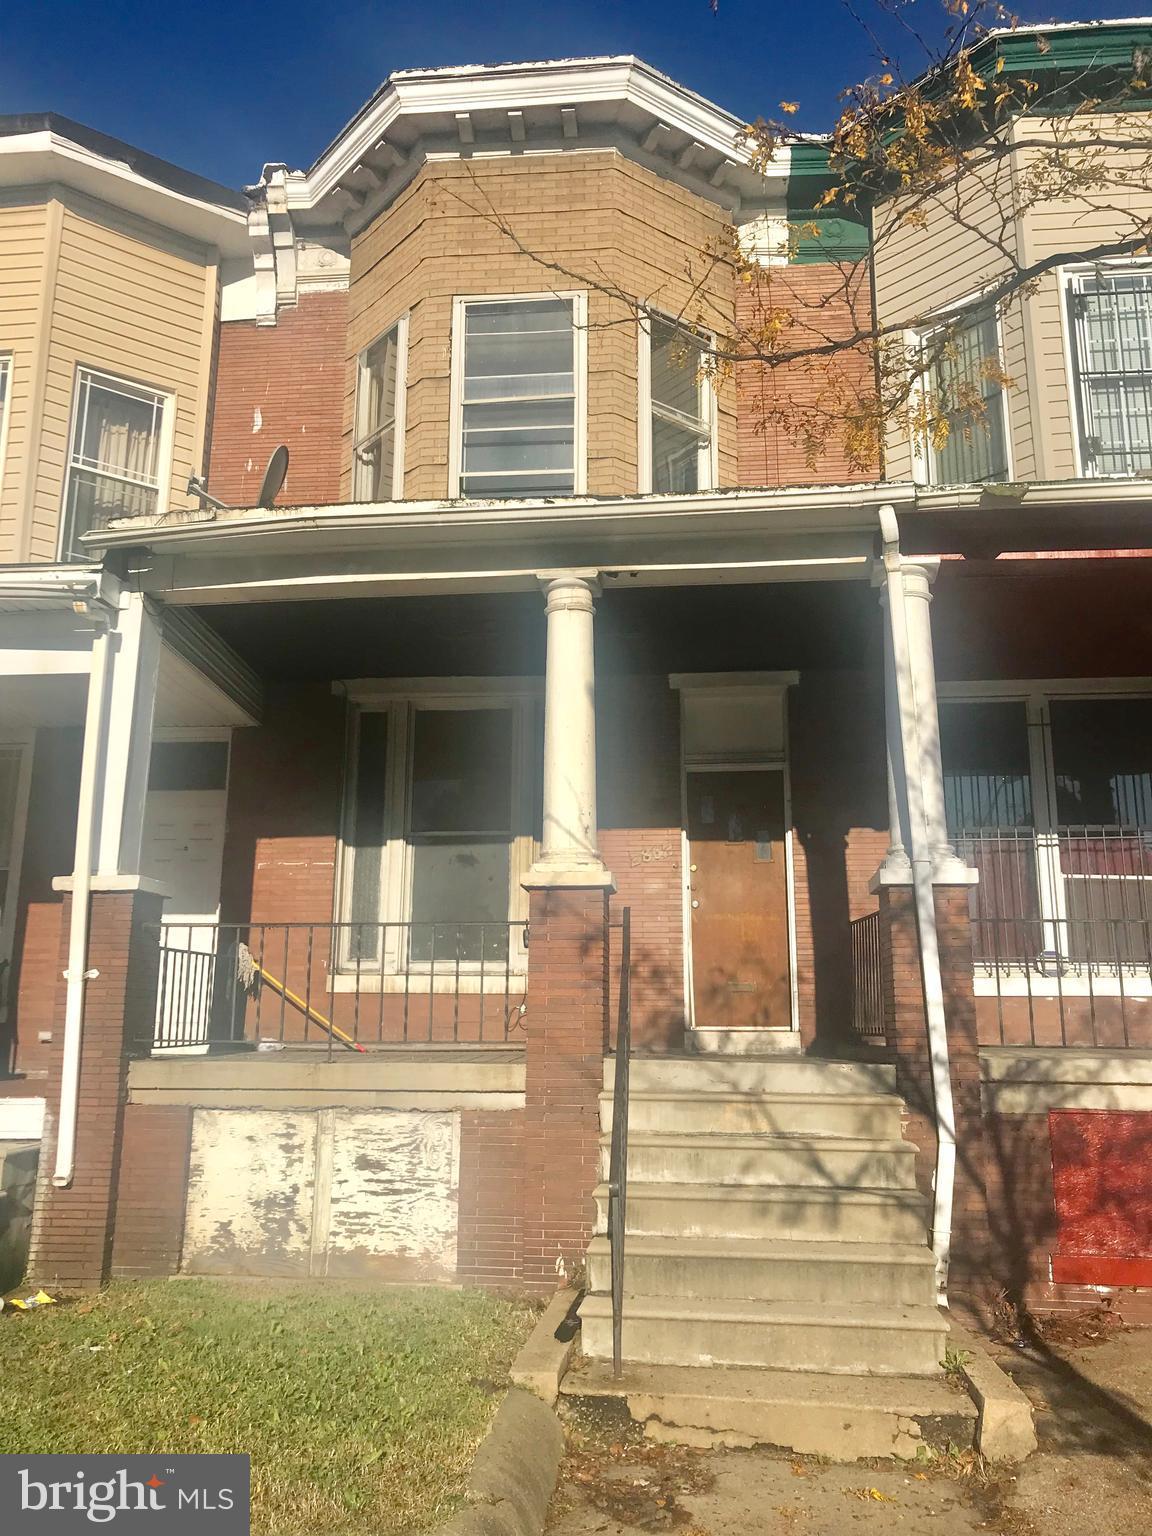 2862 Harford Rd, Baltimore, MD, 21218